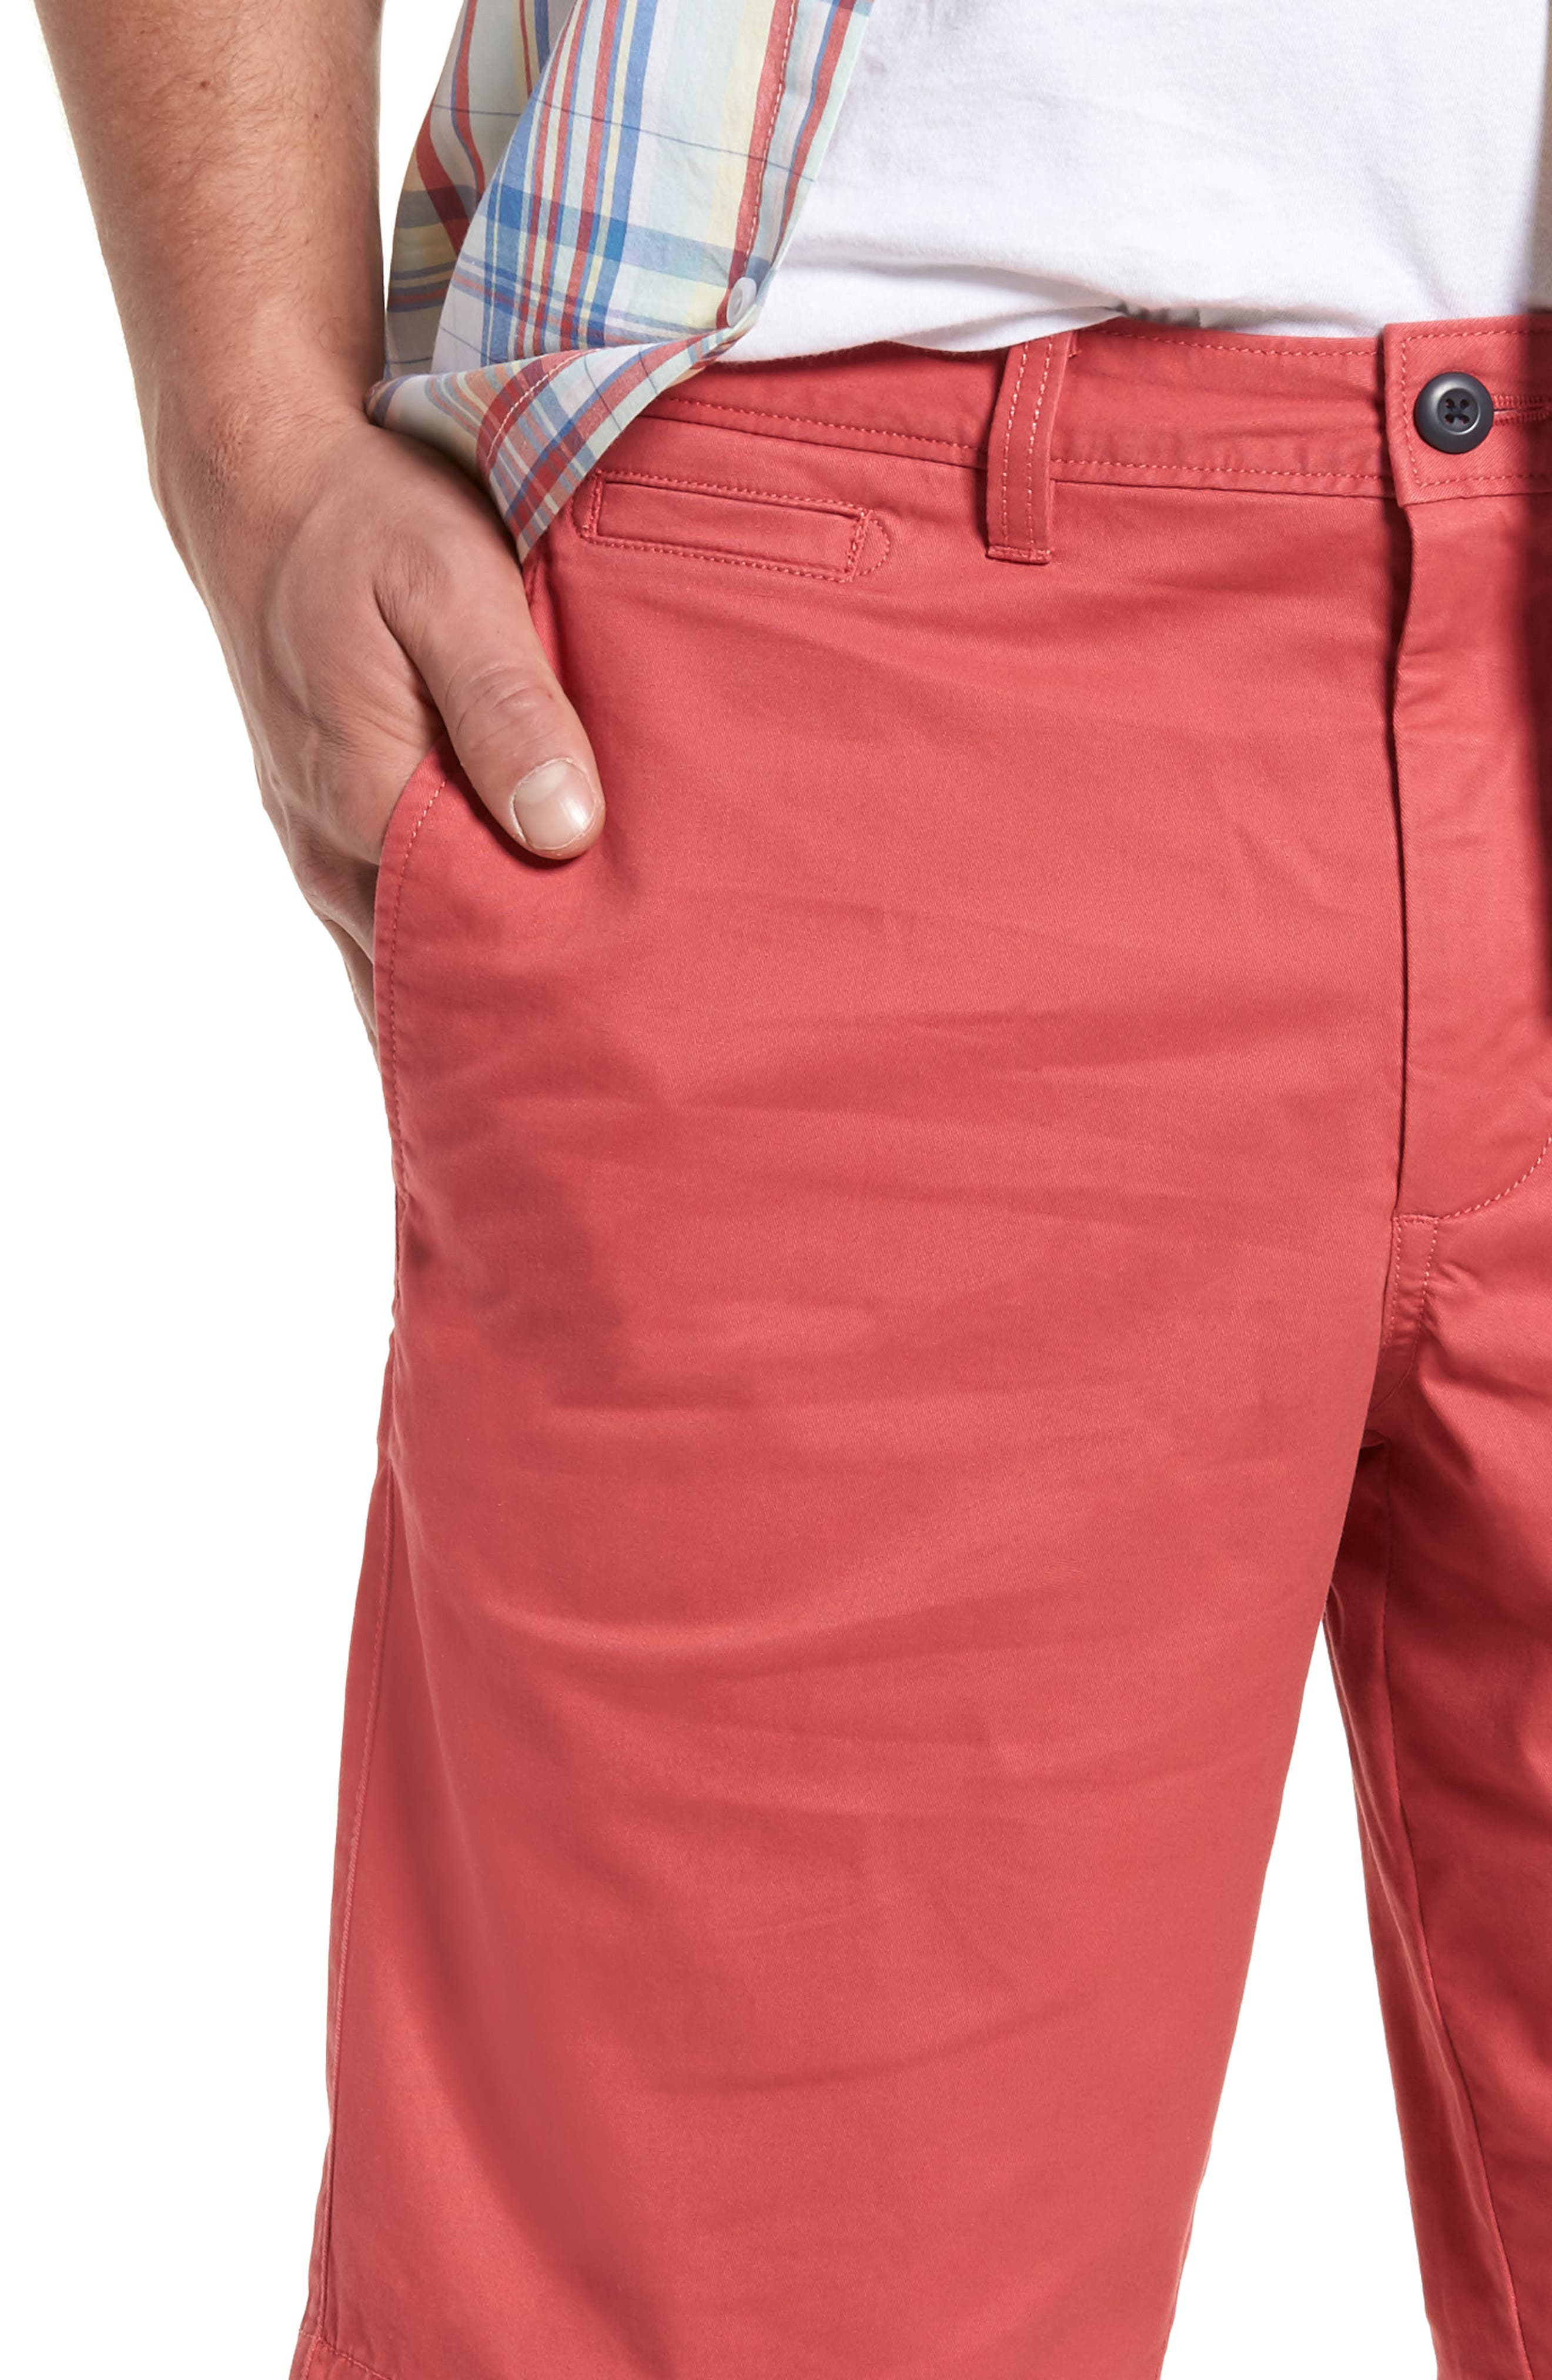 Ballard Slim Fit Stretch Chino 11-Inch Shorts,                             Alternate thumbnail 62, color,